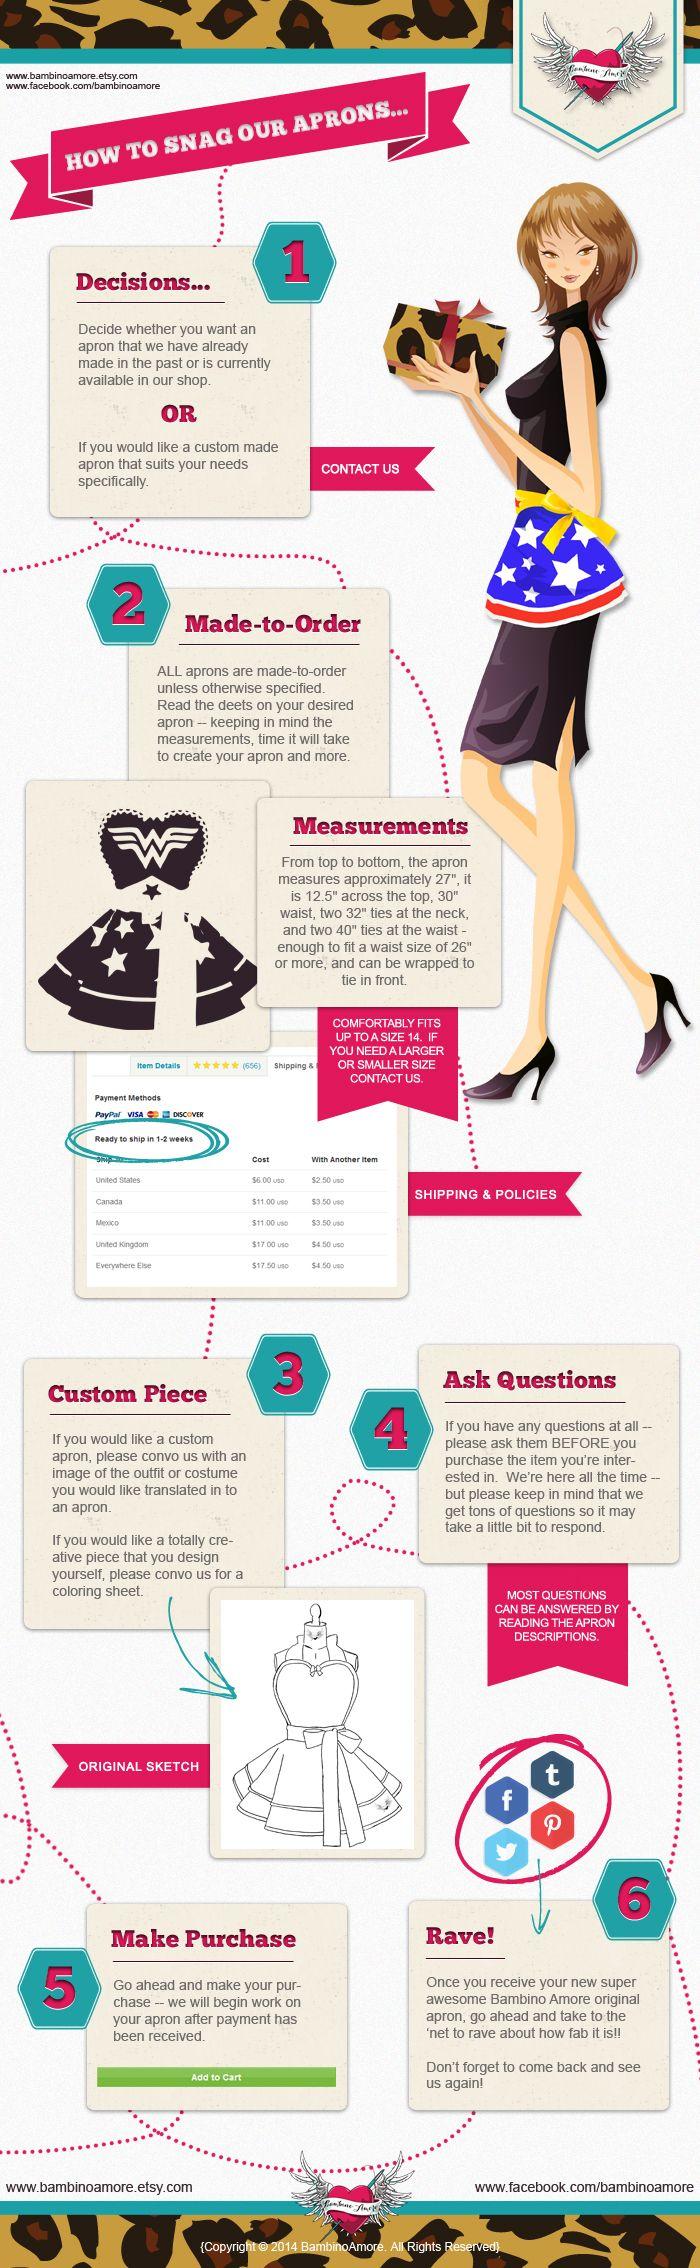 Blue apron questions - Bambino Amore Apron Infographic